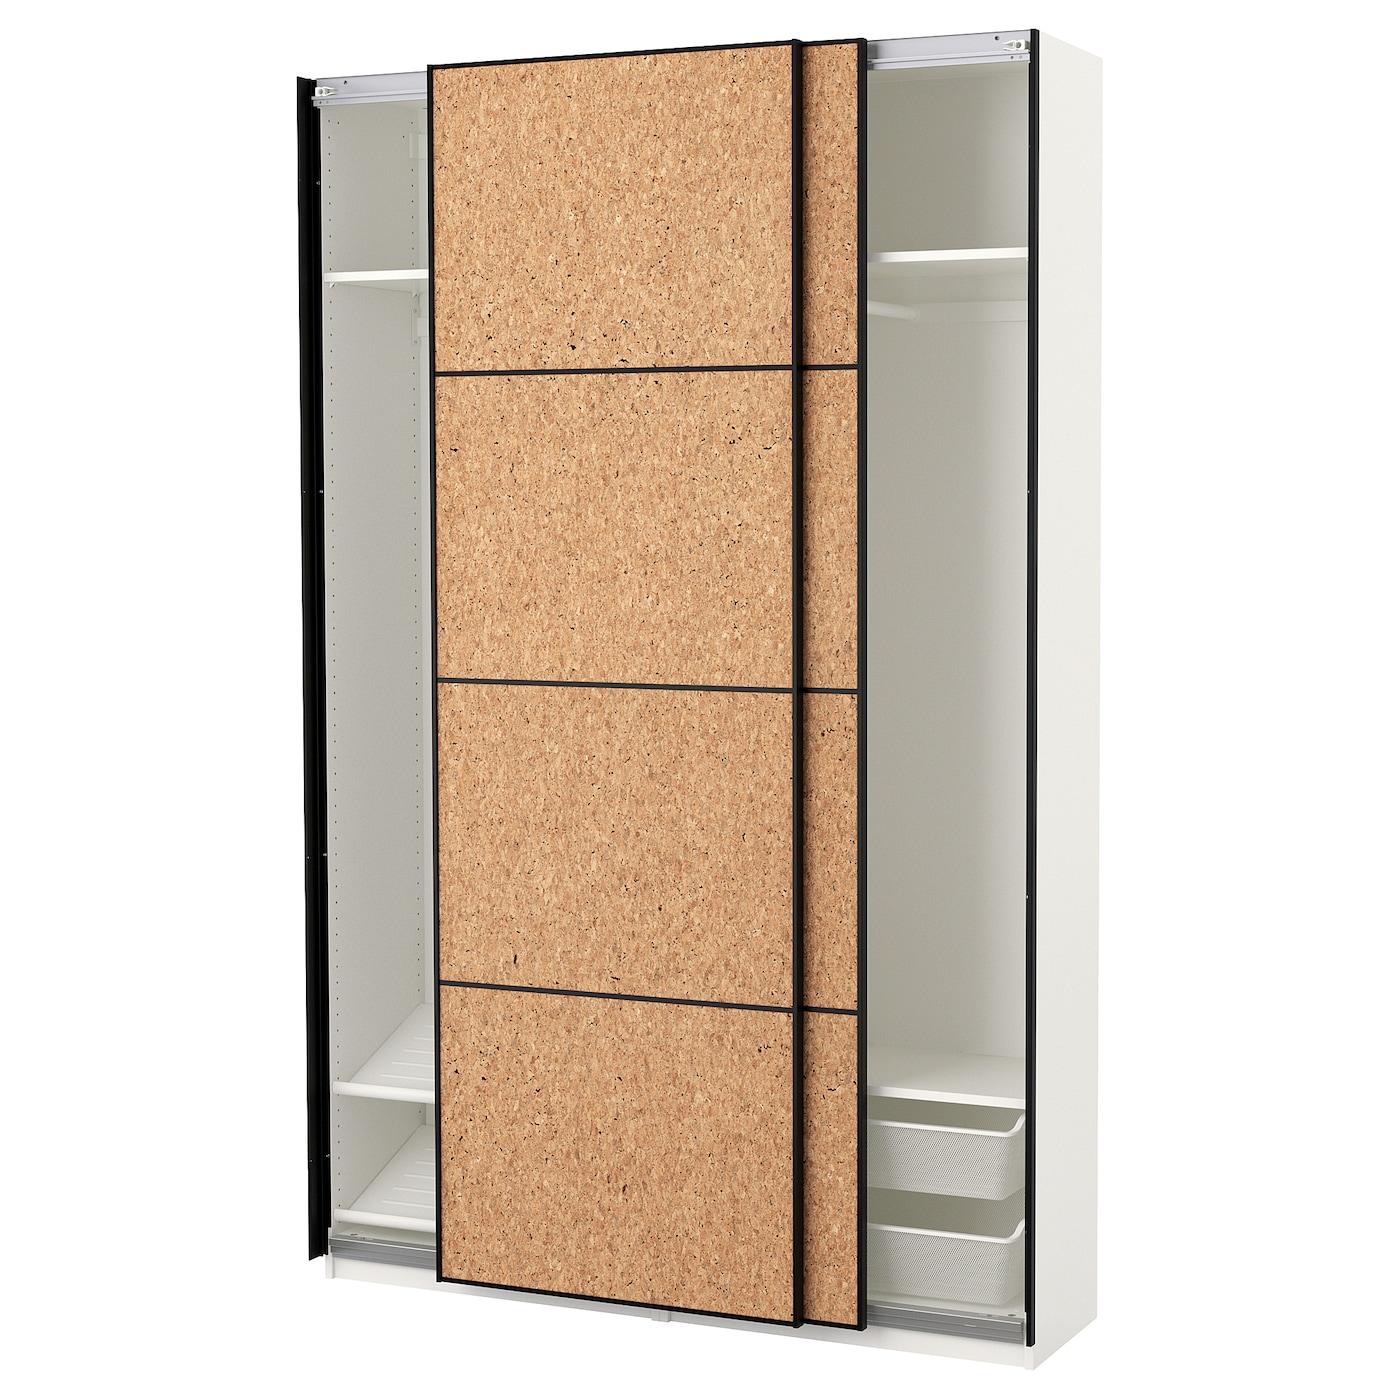 Panneau En Liège Ikea pax armoire-penderie - blanc, kirkenes placage de liège 150x44x236 cm